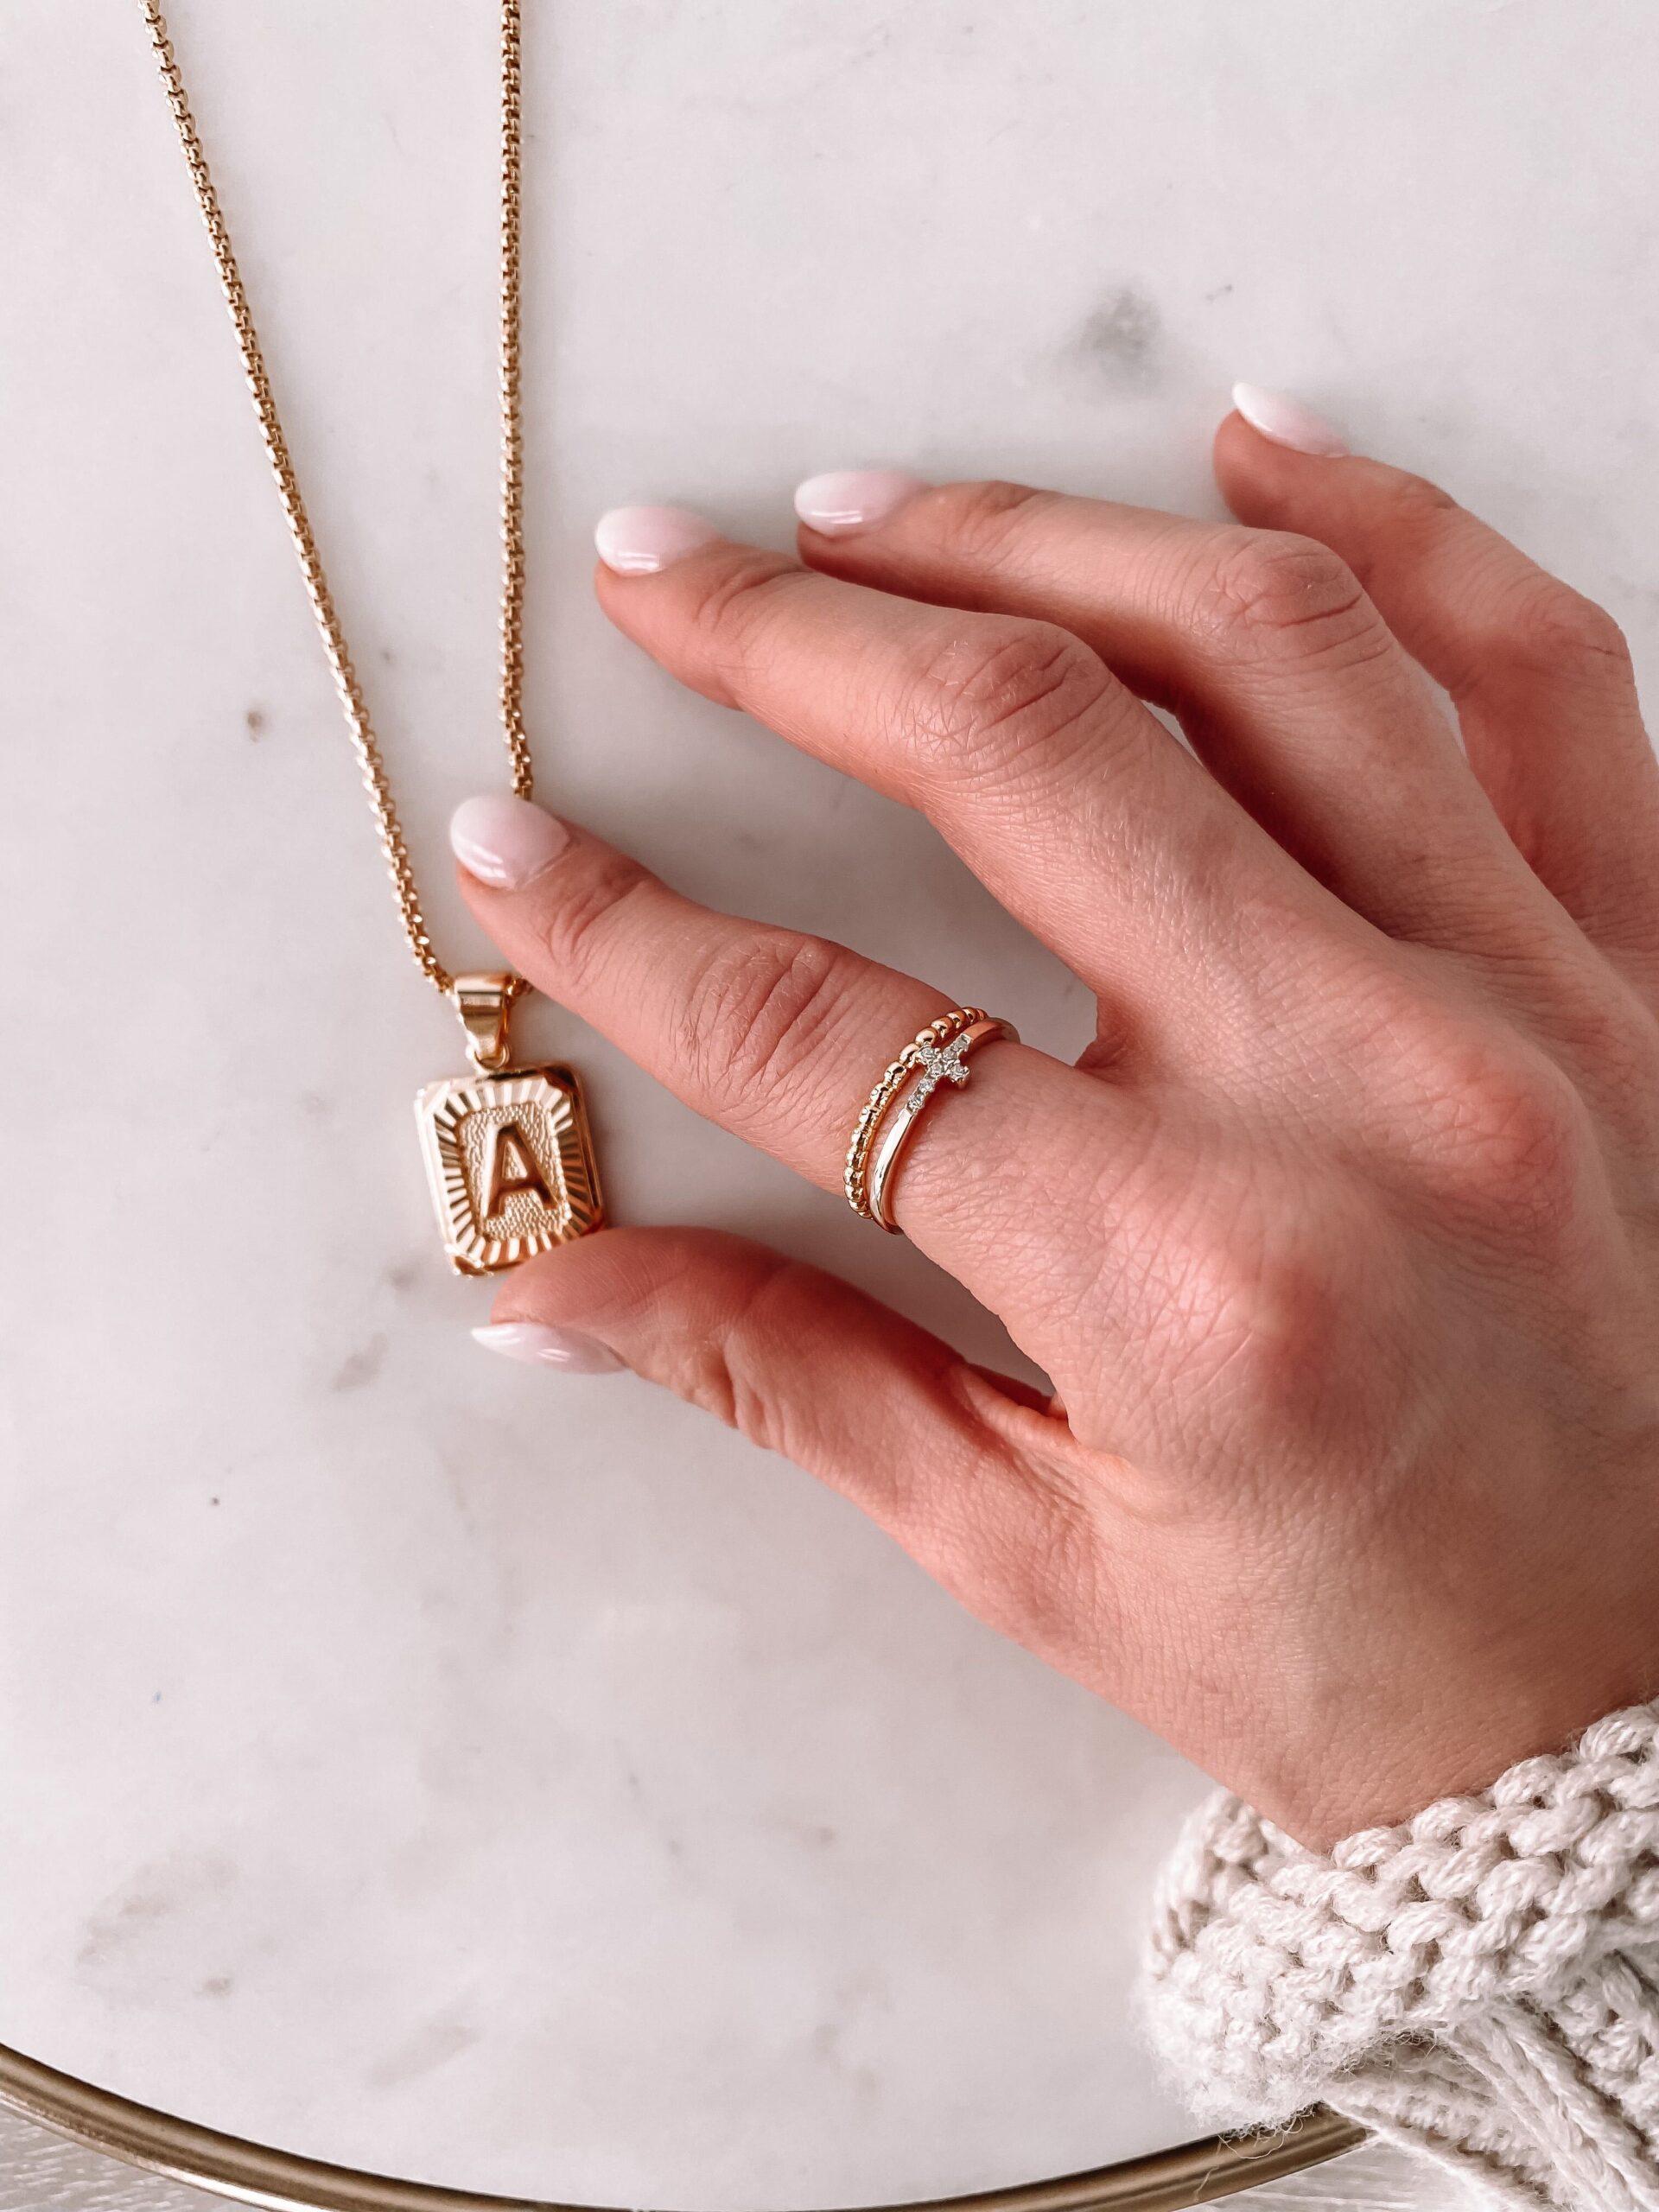 Amazon necklace, amazon jewelry